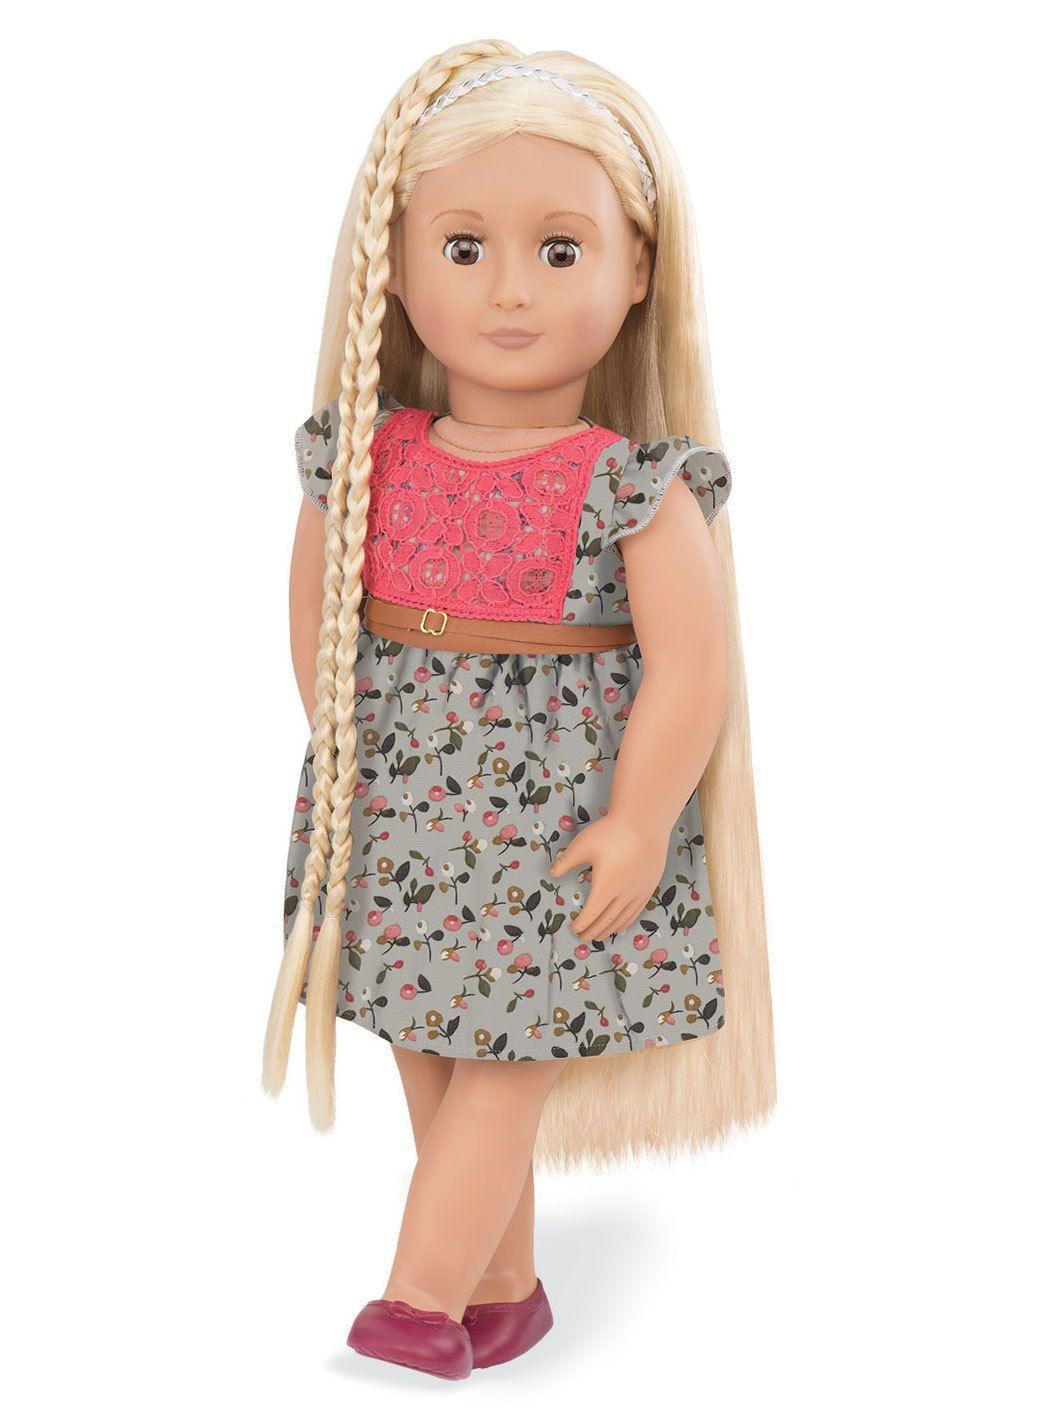 Pink Wigs Ebay